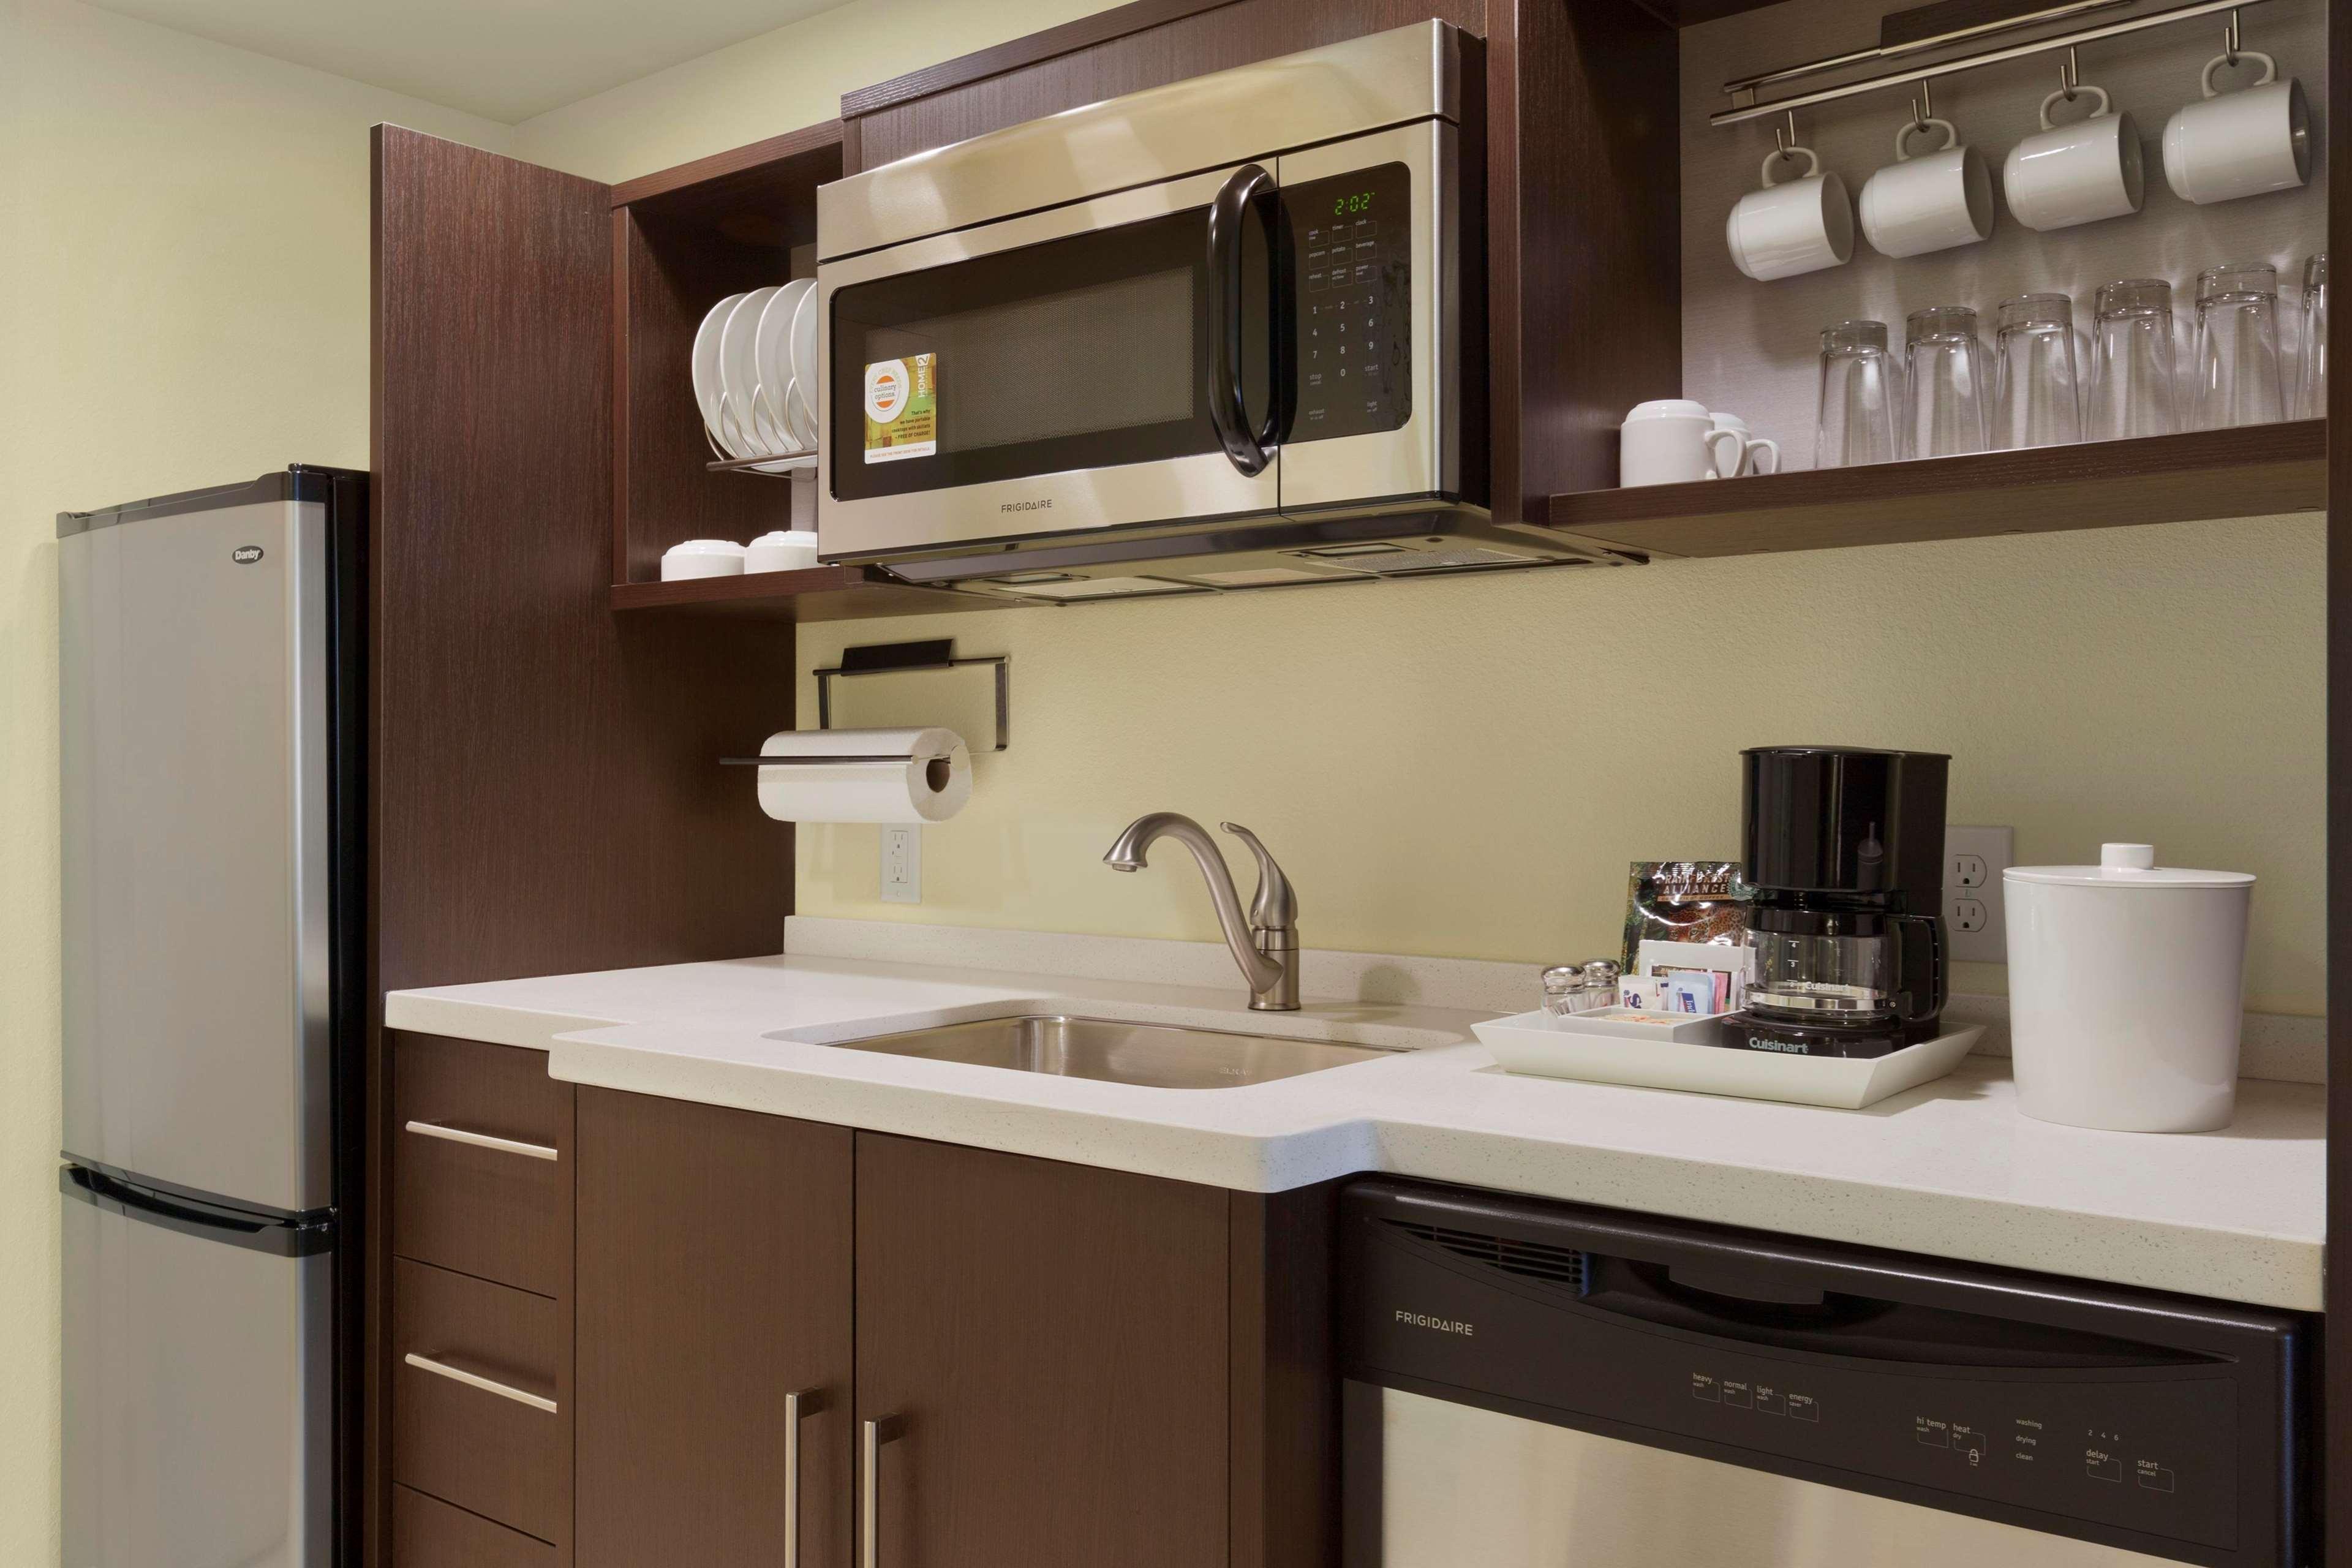 Home2 suites by hilton canton canton ohio for Table 6 kitchen canton ohio